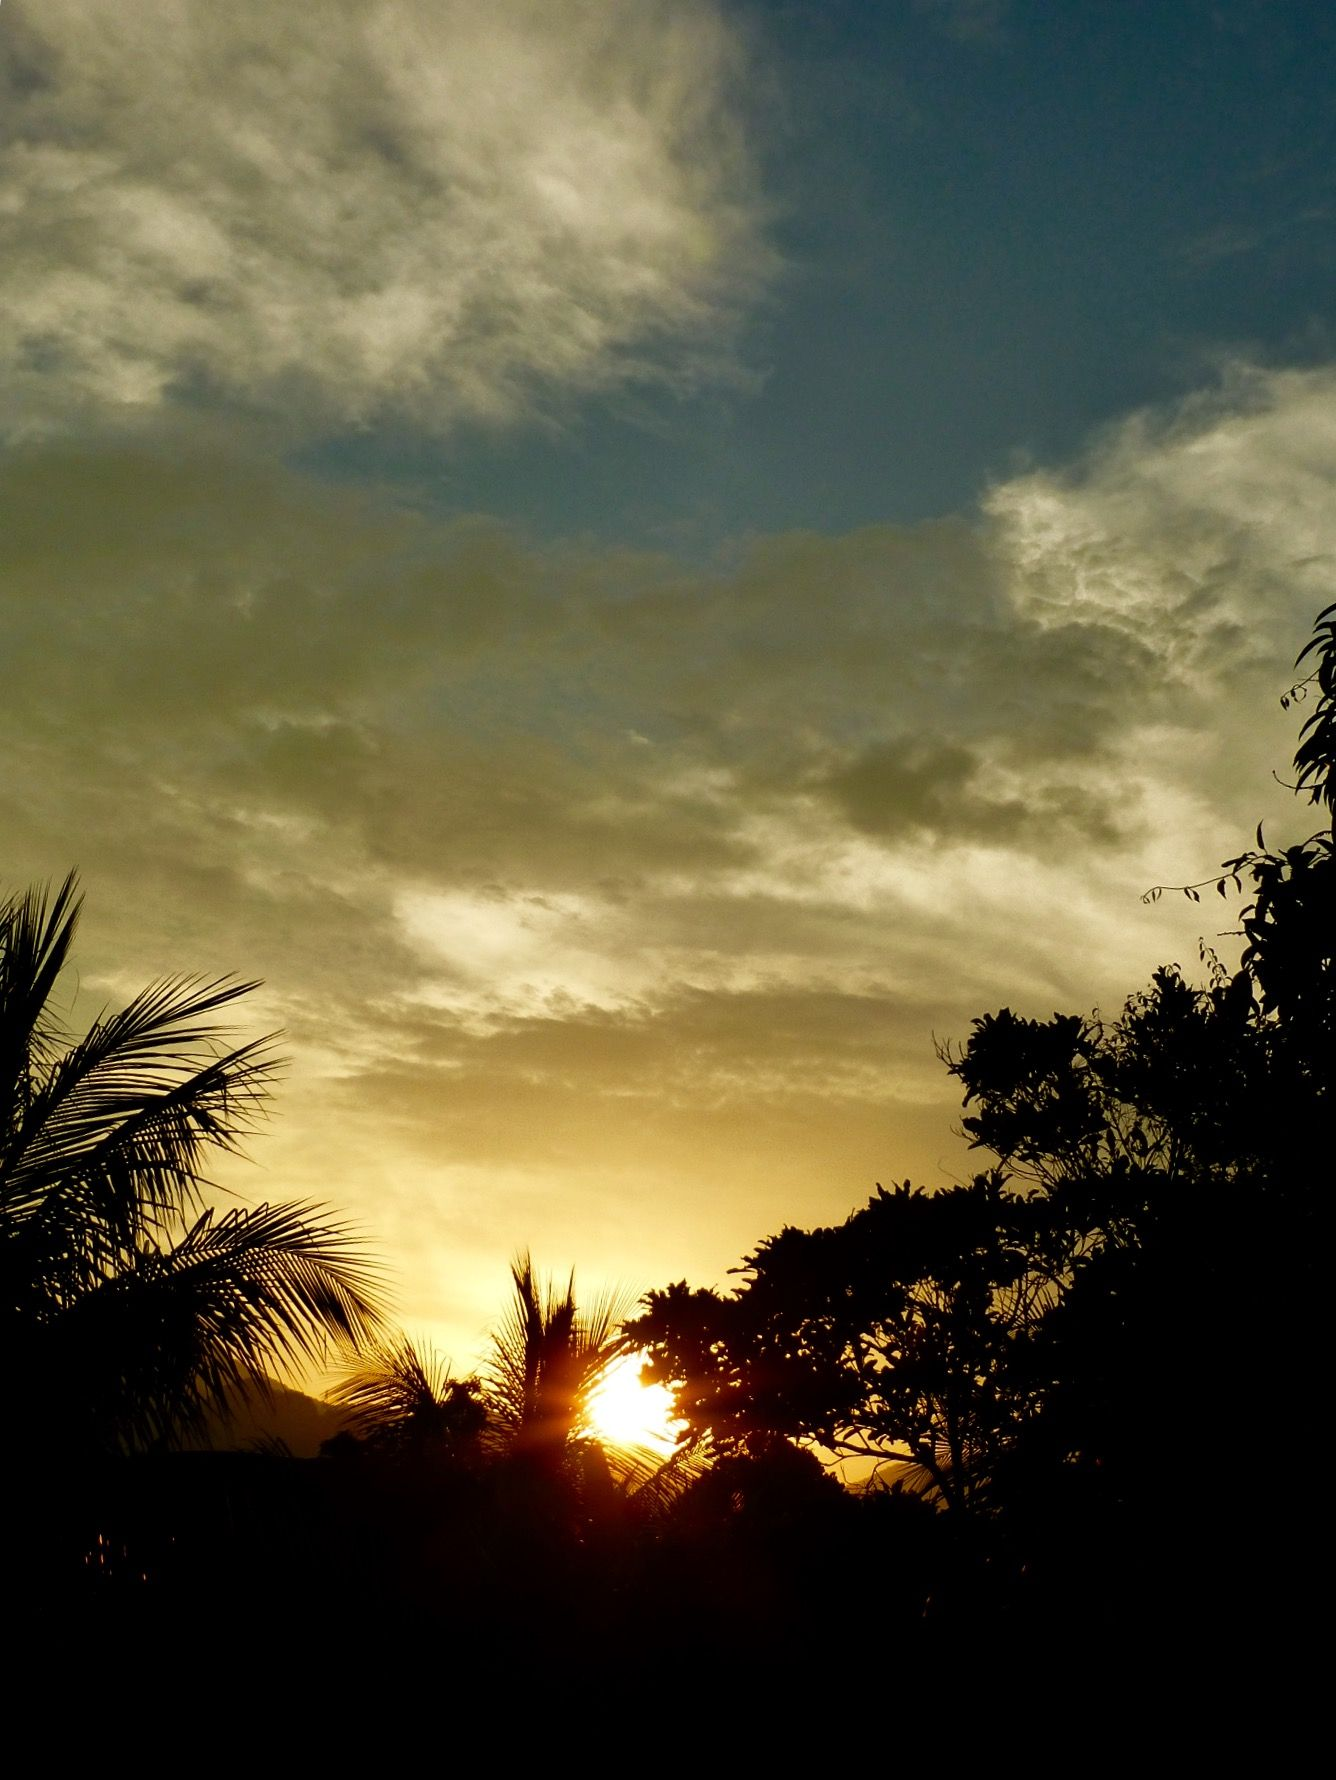 Sunset / Pôr do sol / Photo by armrebello